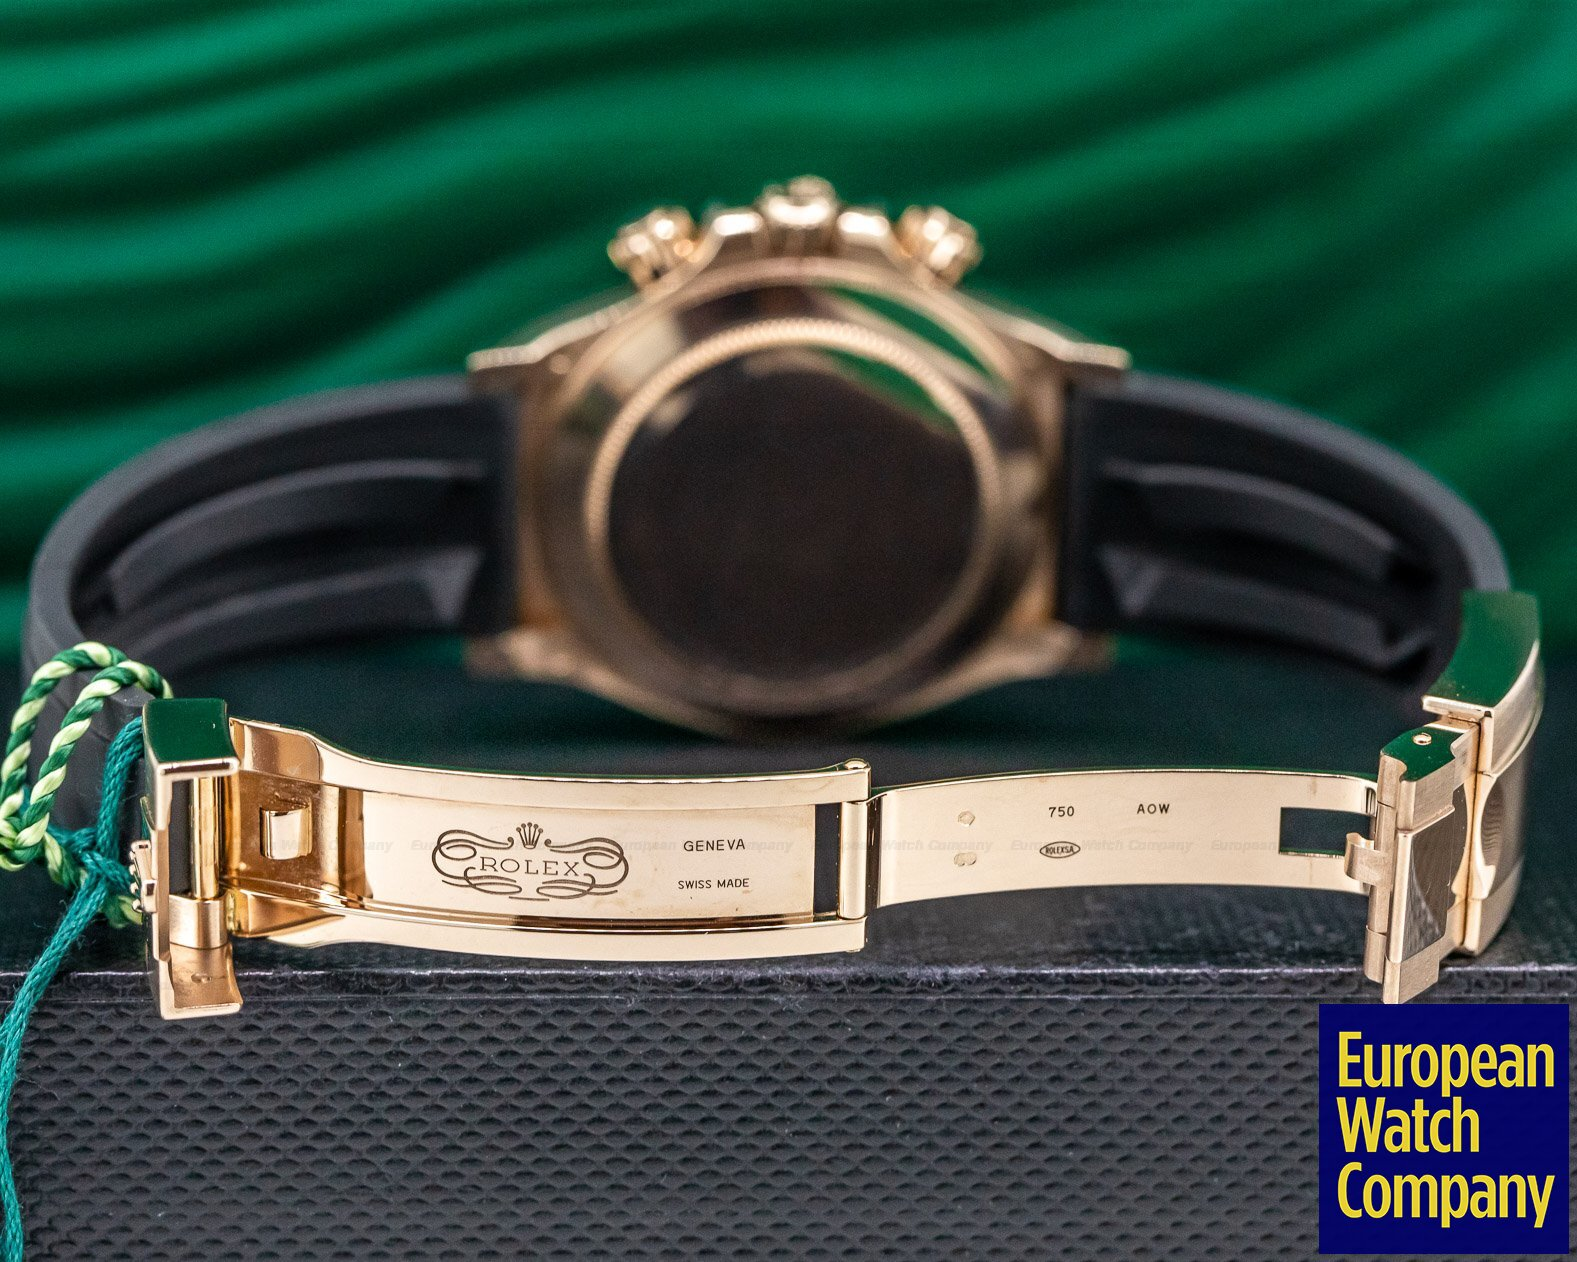 Rolex 116515LN Cosmograph Daytona Ceramic 18K Everose Gold / Black Dial